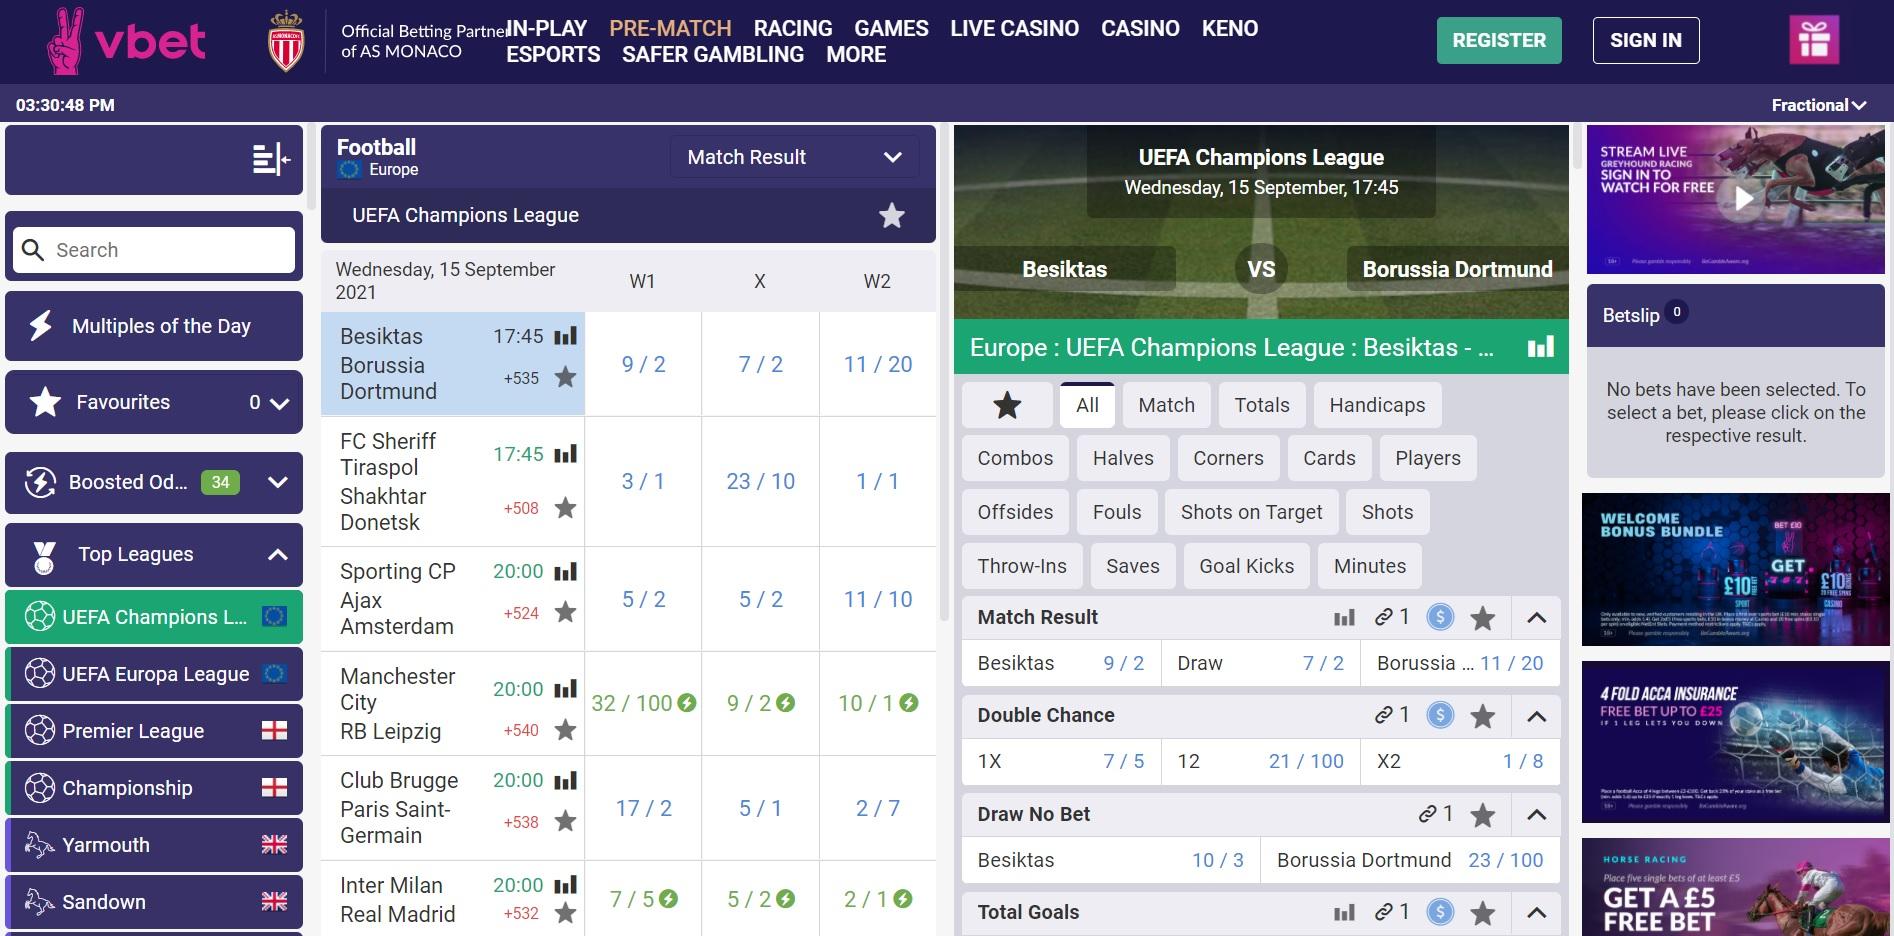 Best betting sites UK Vbet